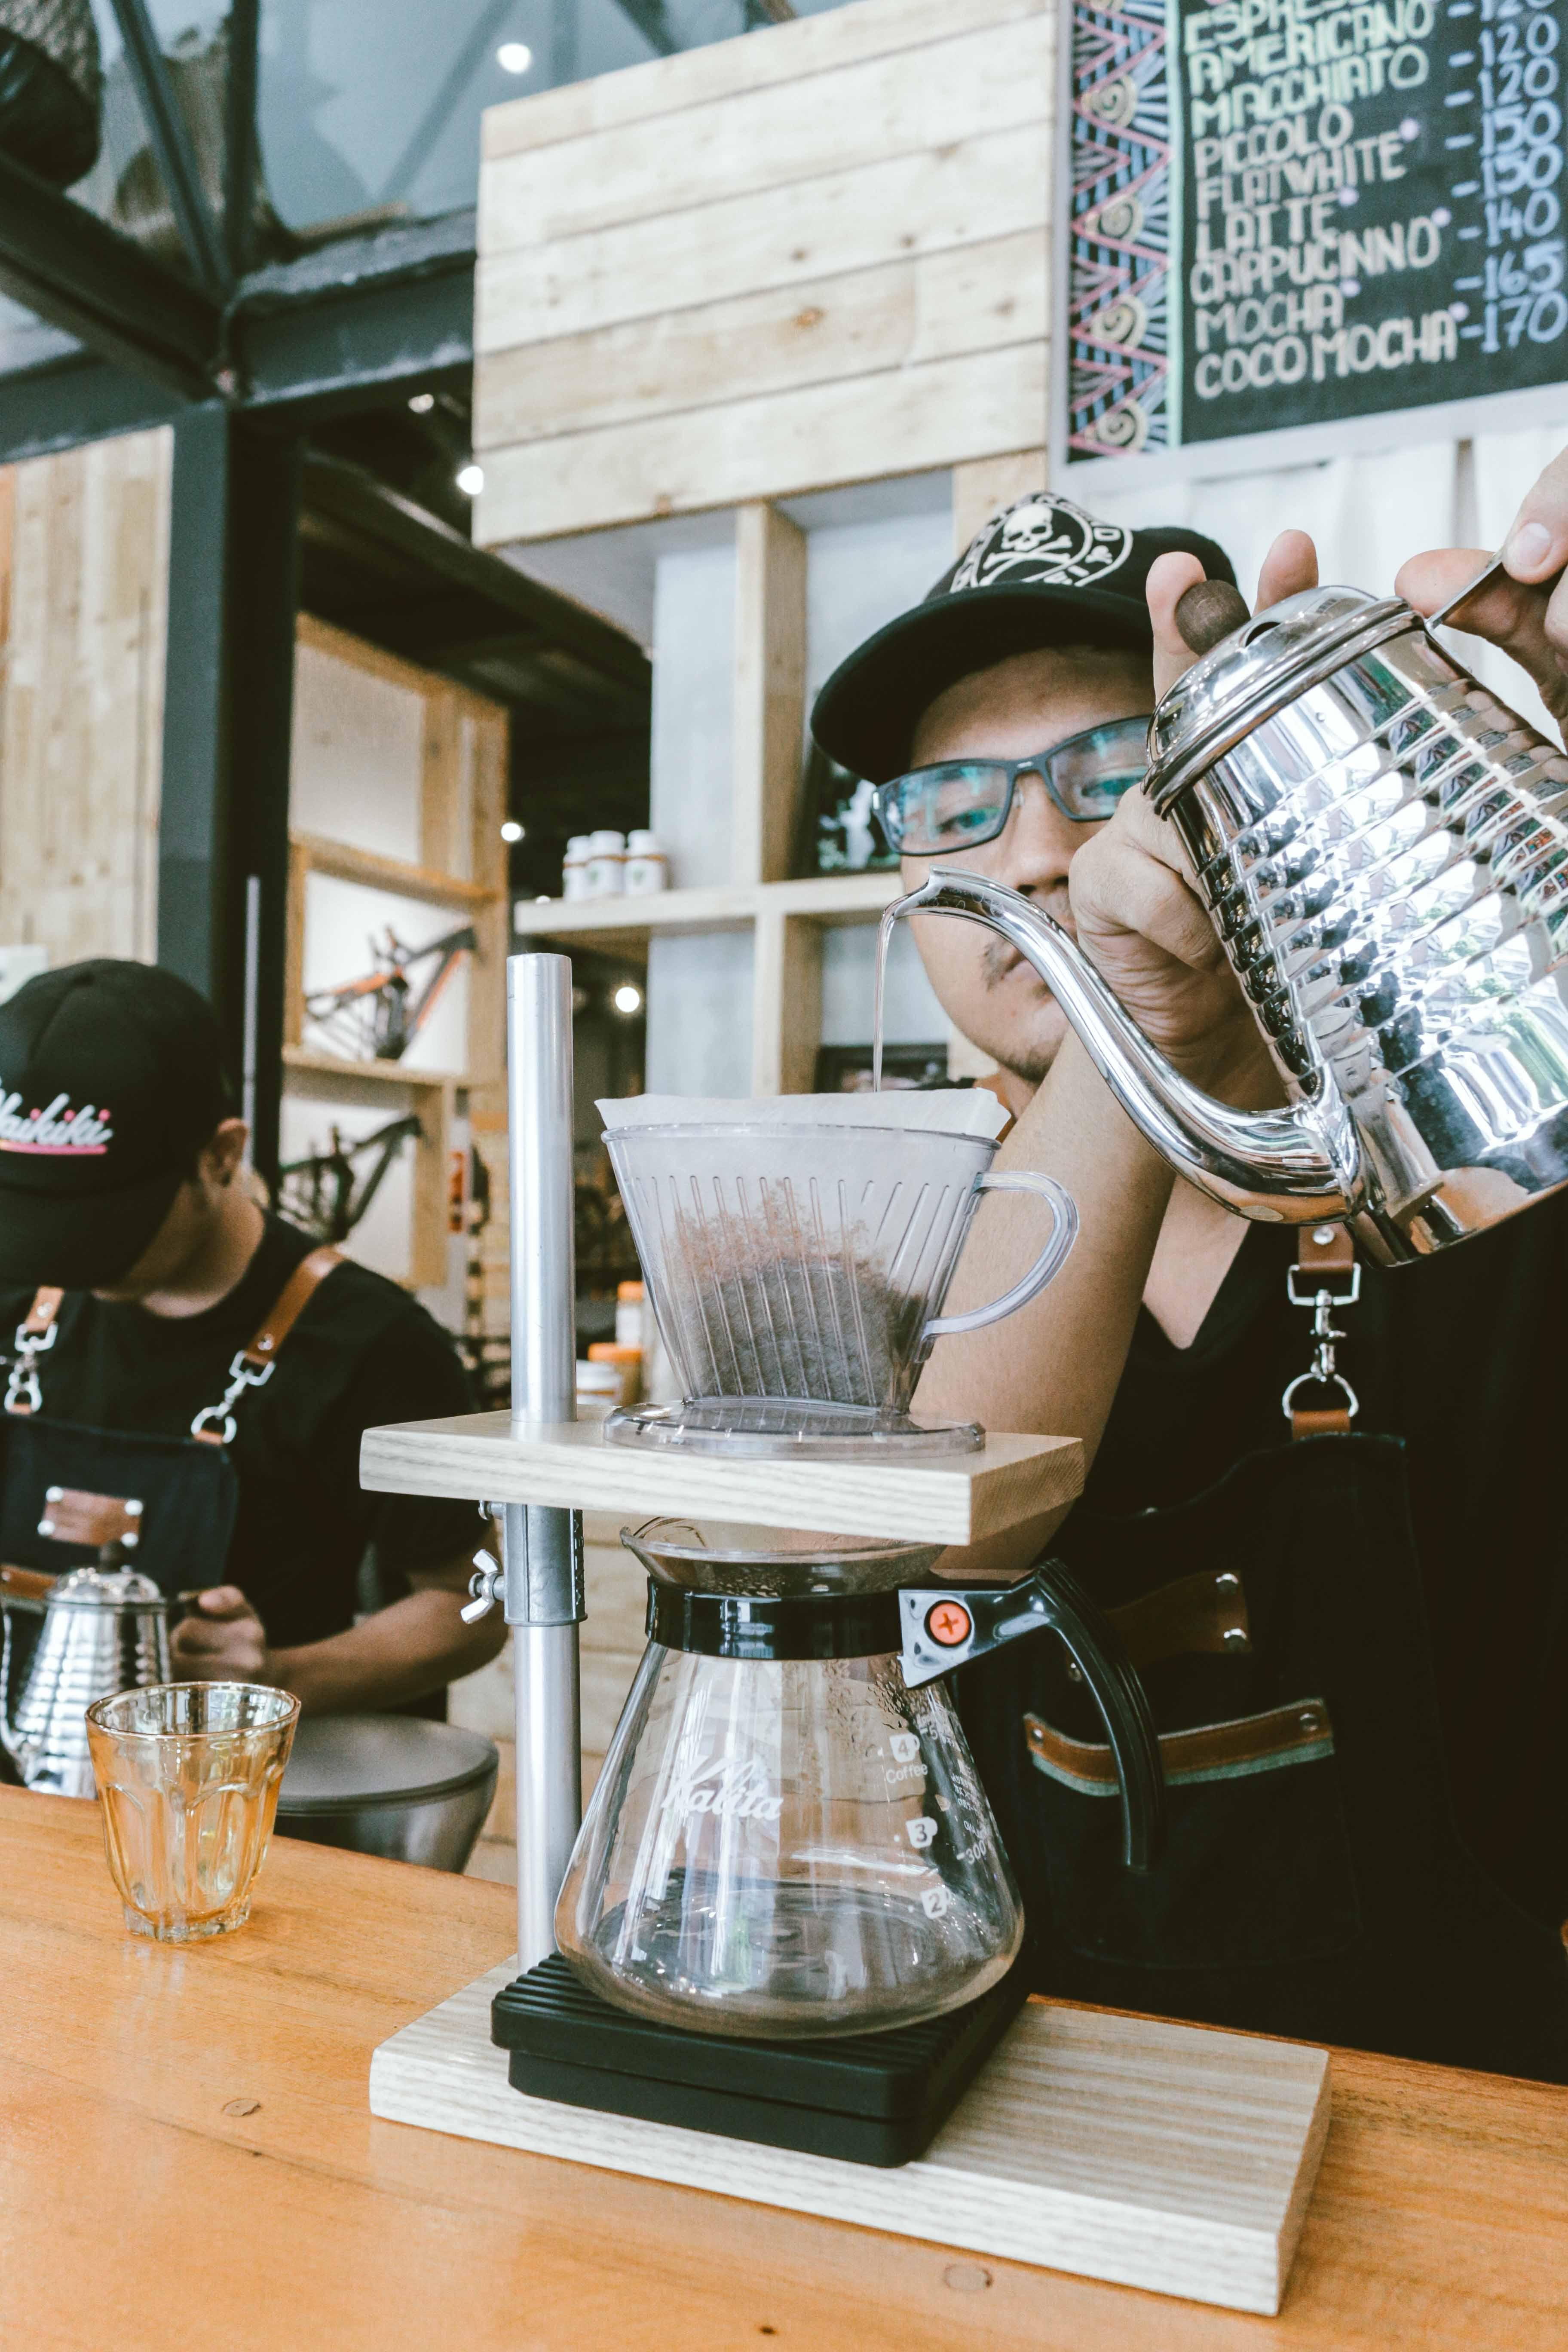 nolisoli eats restaurant hineleban cafe